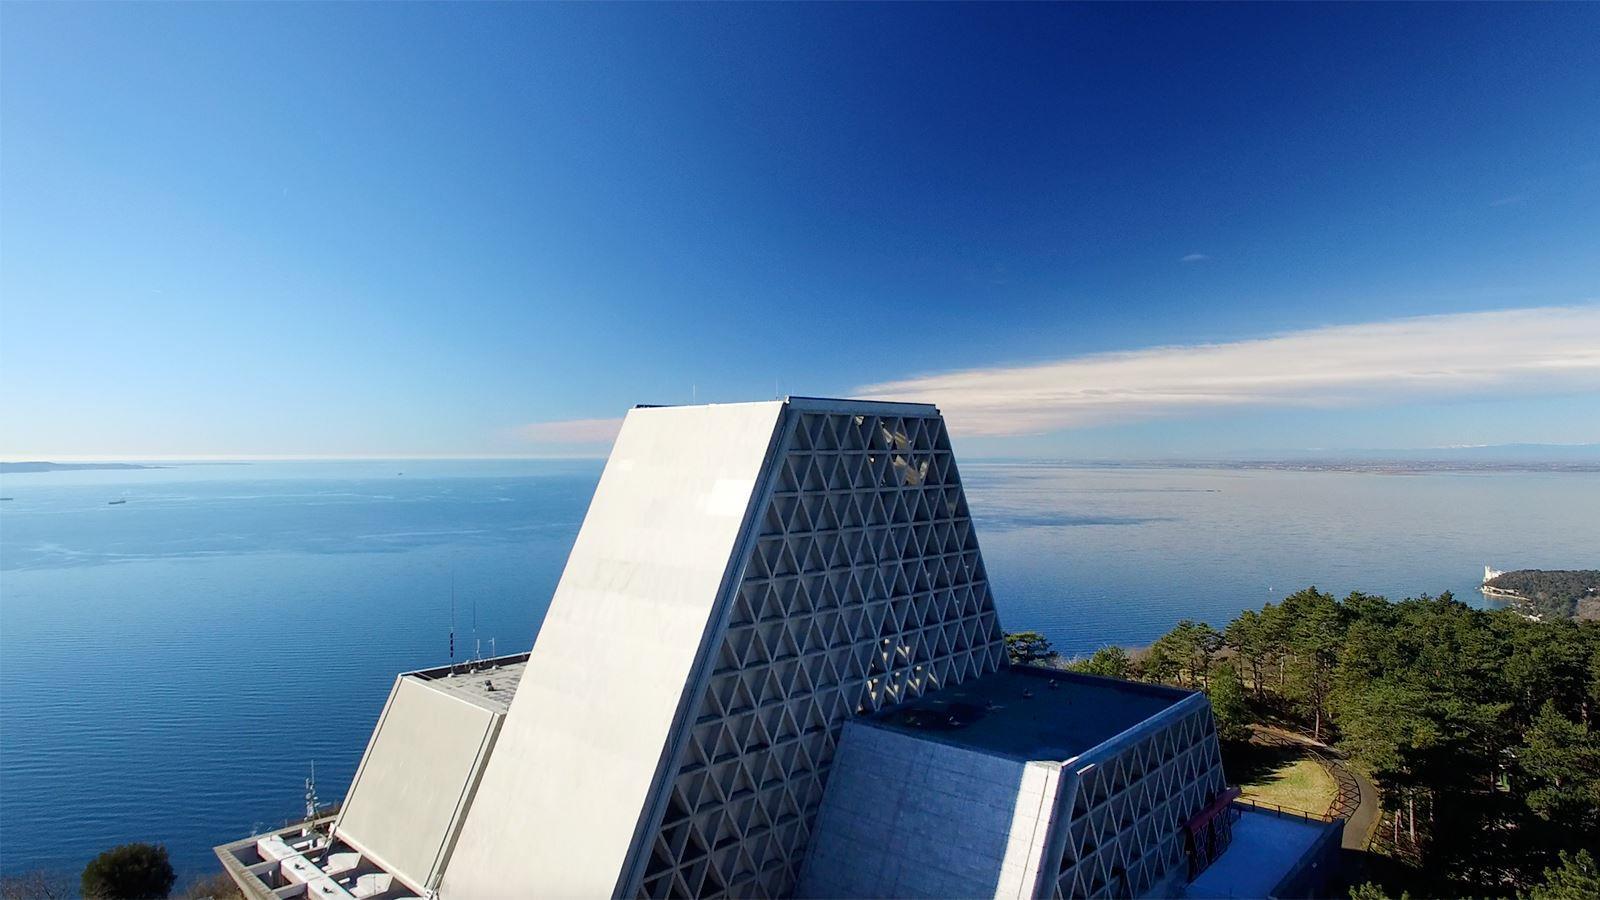 Il santuario di Monte Grisa, a Trieste (www.turismofvg.it)